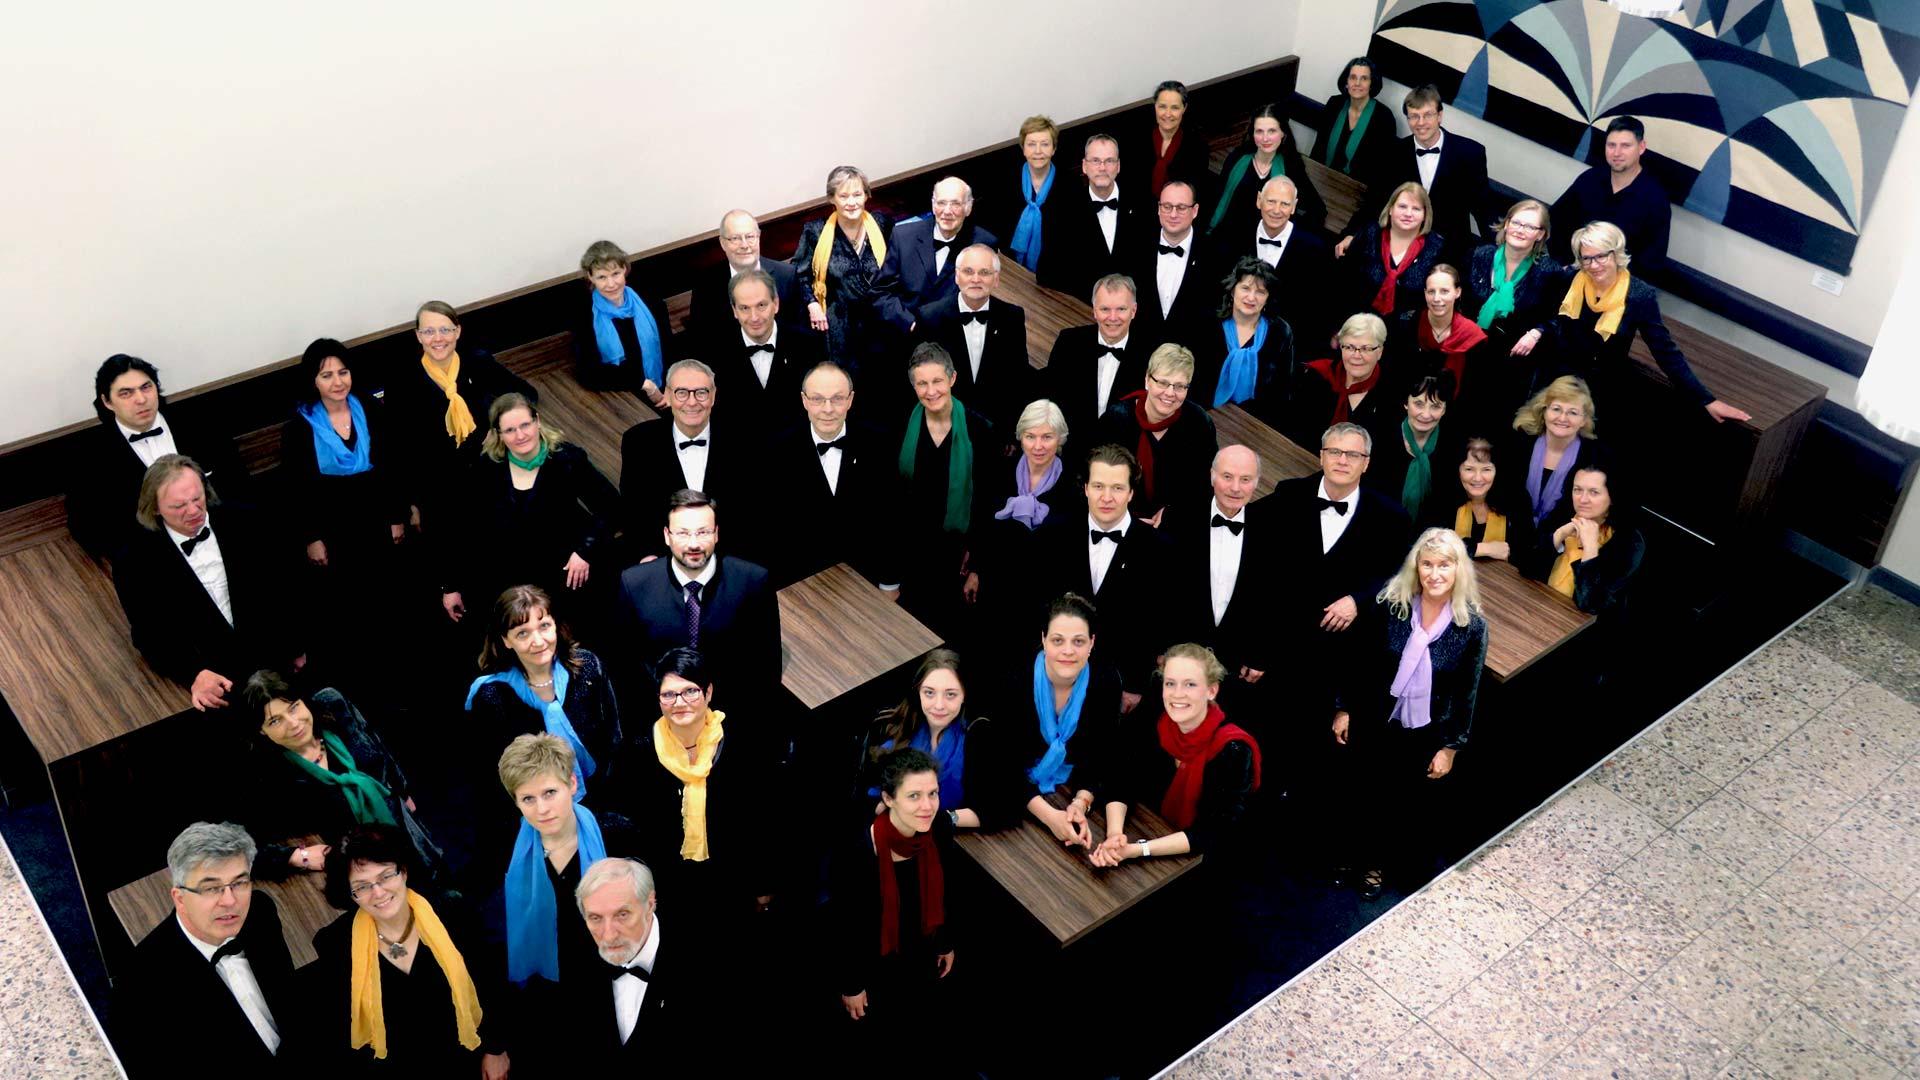 Singakademie Rostock - Gruppenfoto 2018